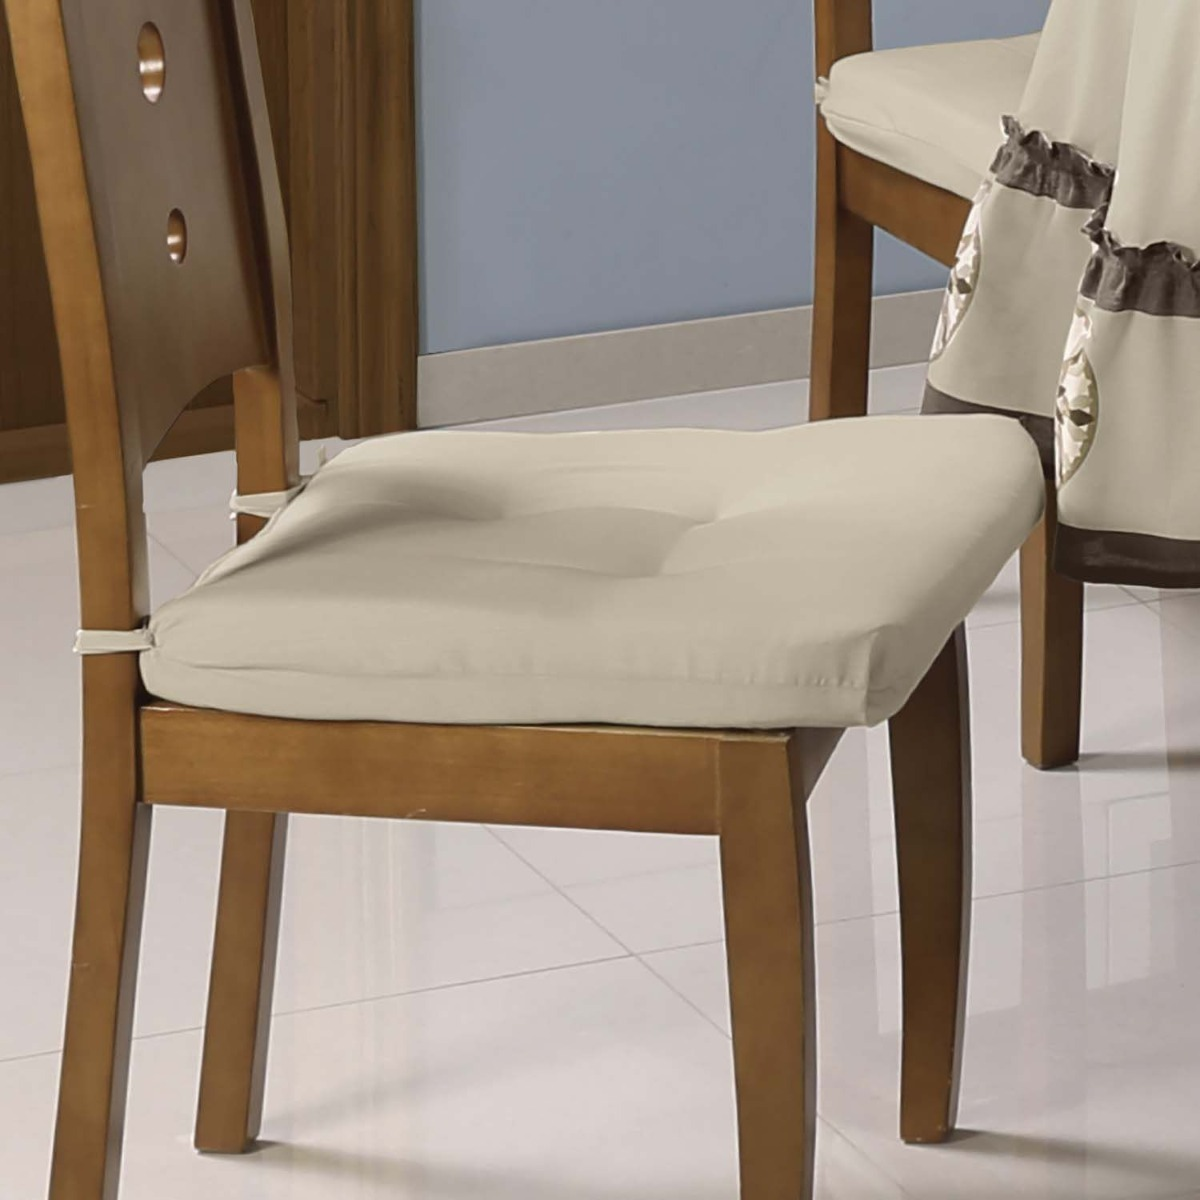 Concord jgo de 4 cojines para silla de comedor caramel en mercado libre - Cojines redondos para sillas ...